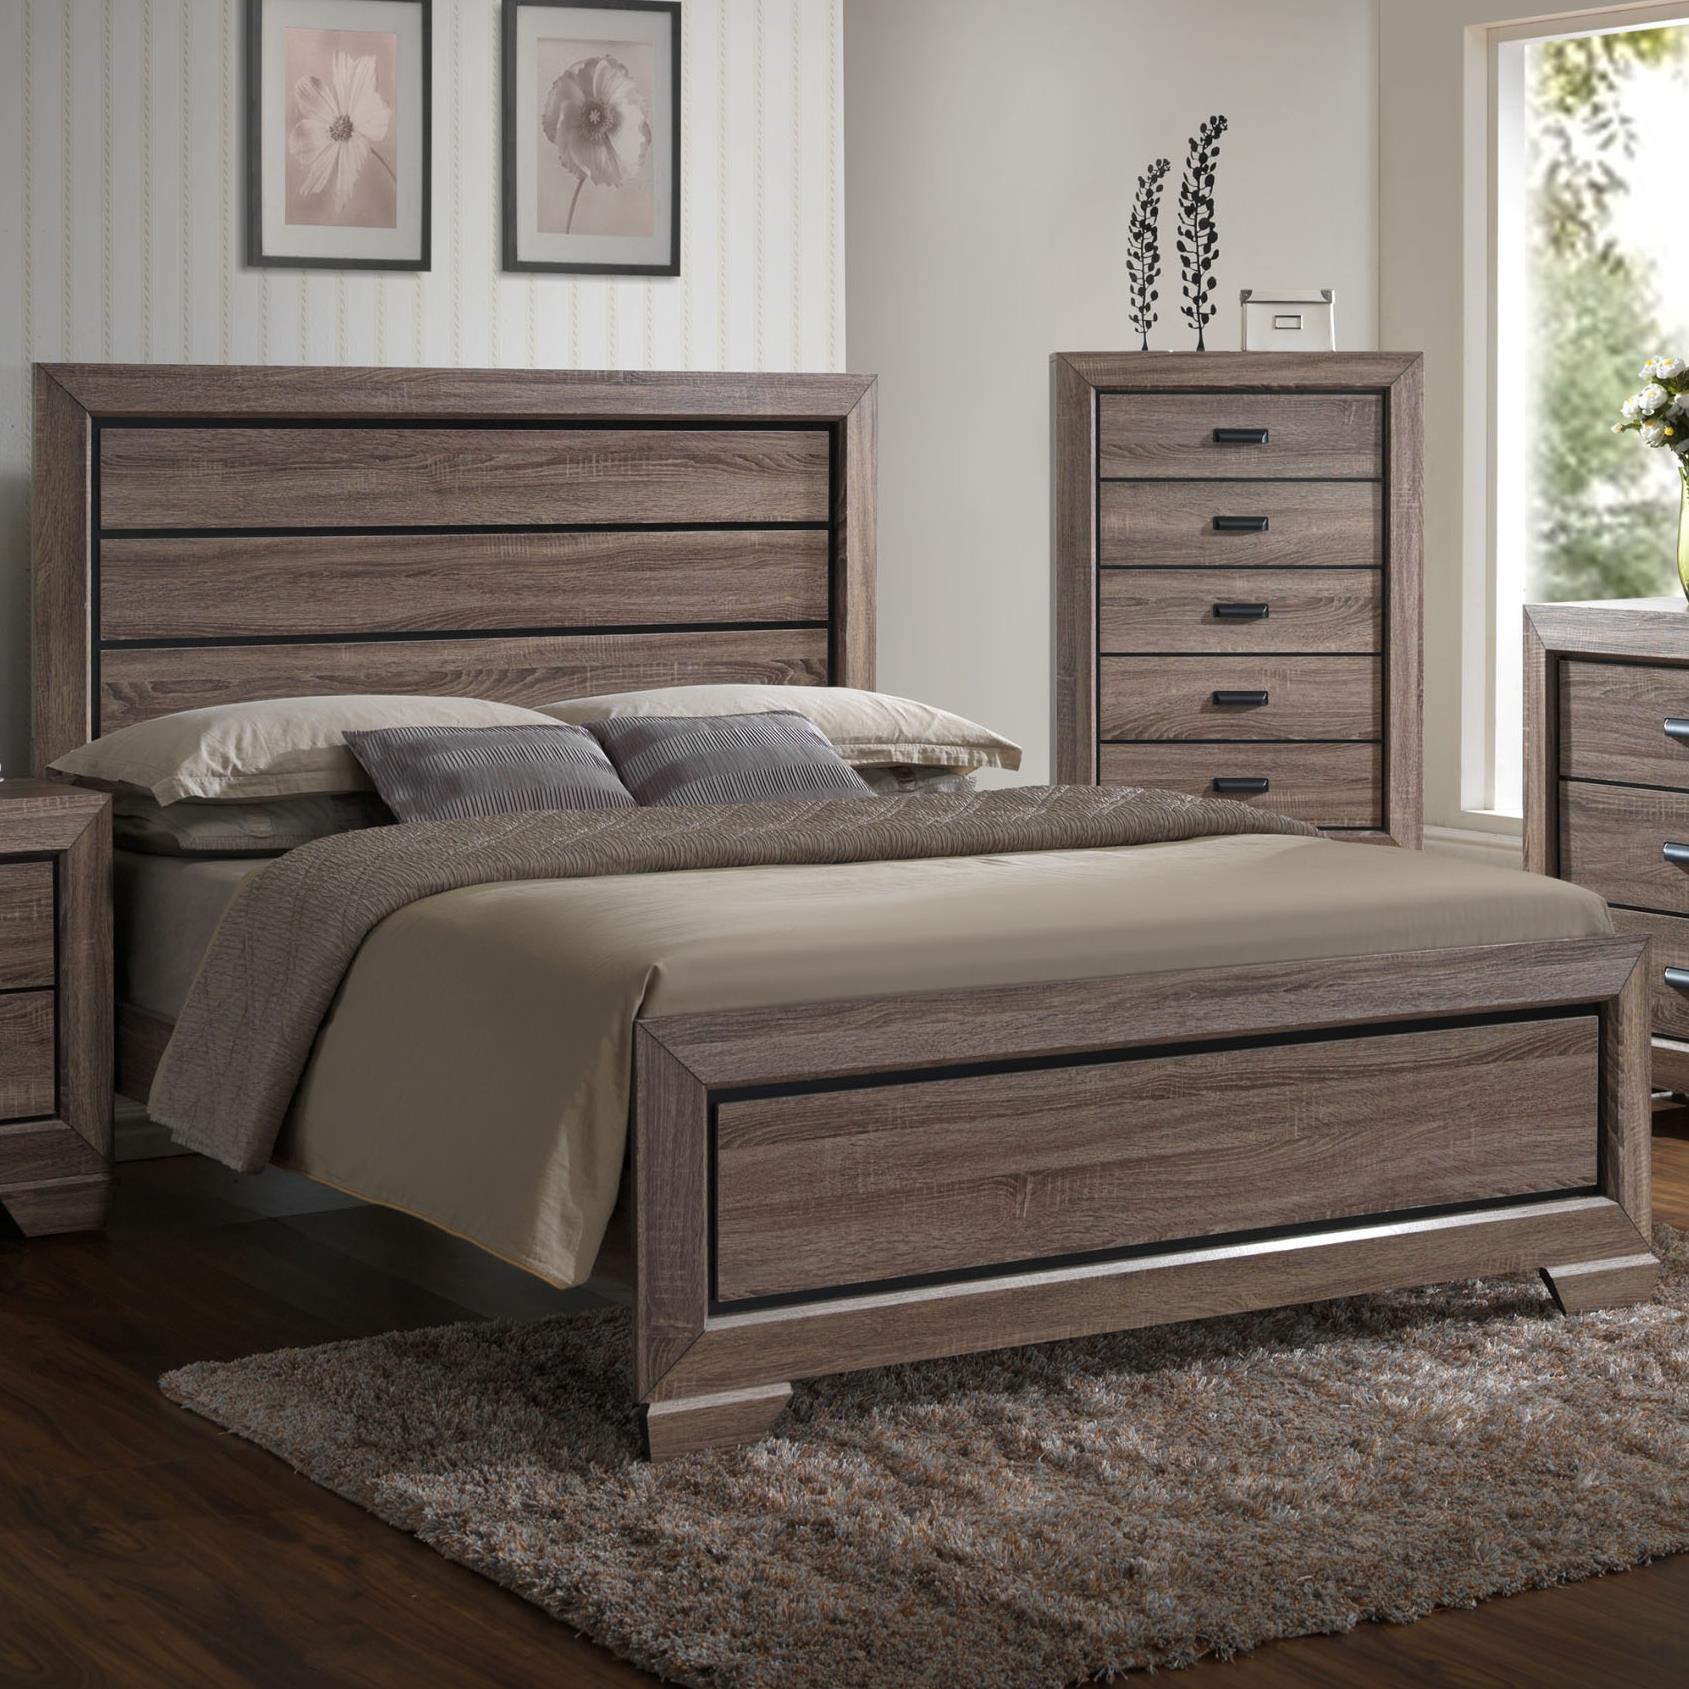 Crown mark farrow king headboard and footboard panel bed for King footboard